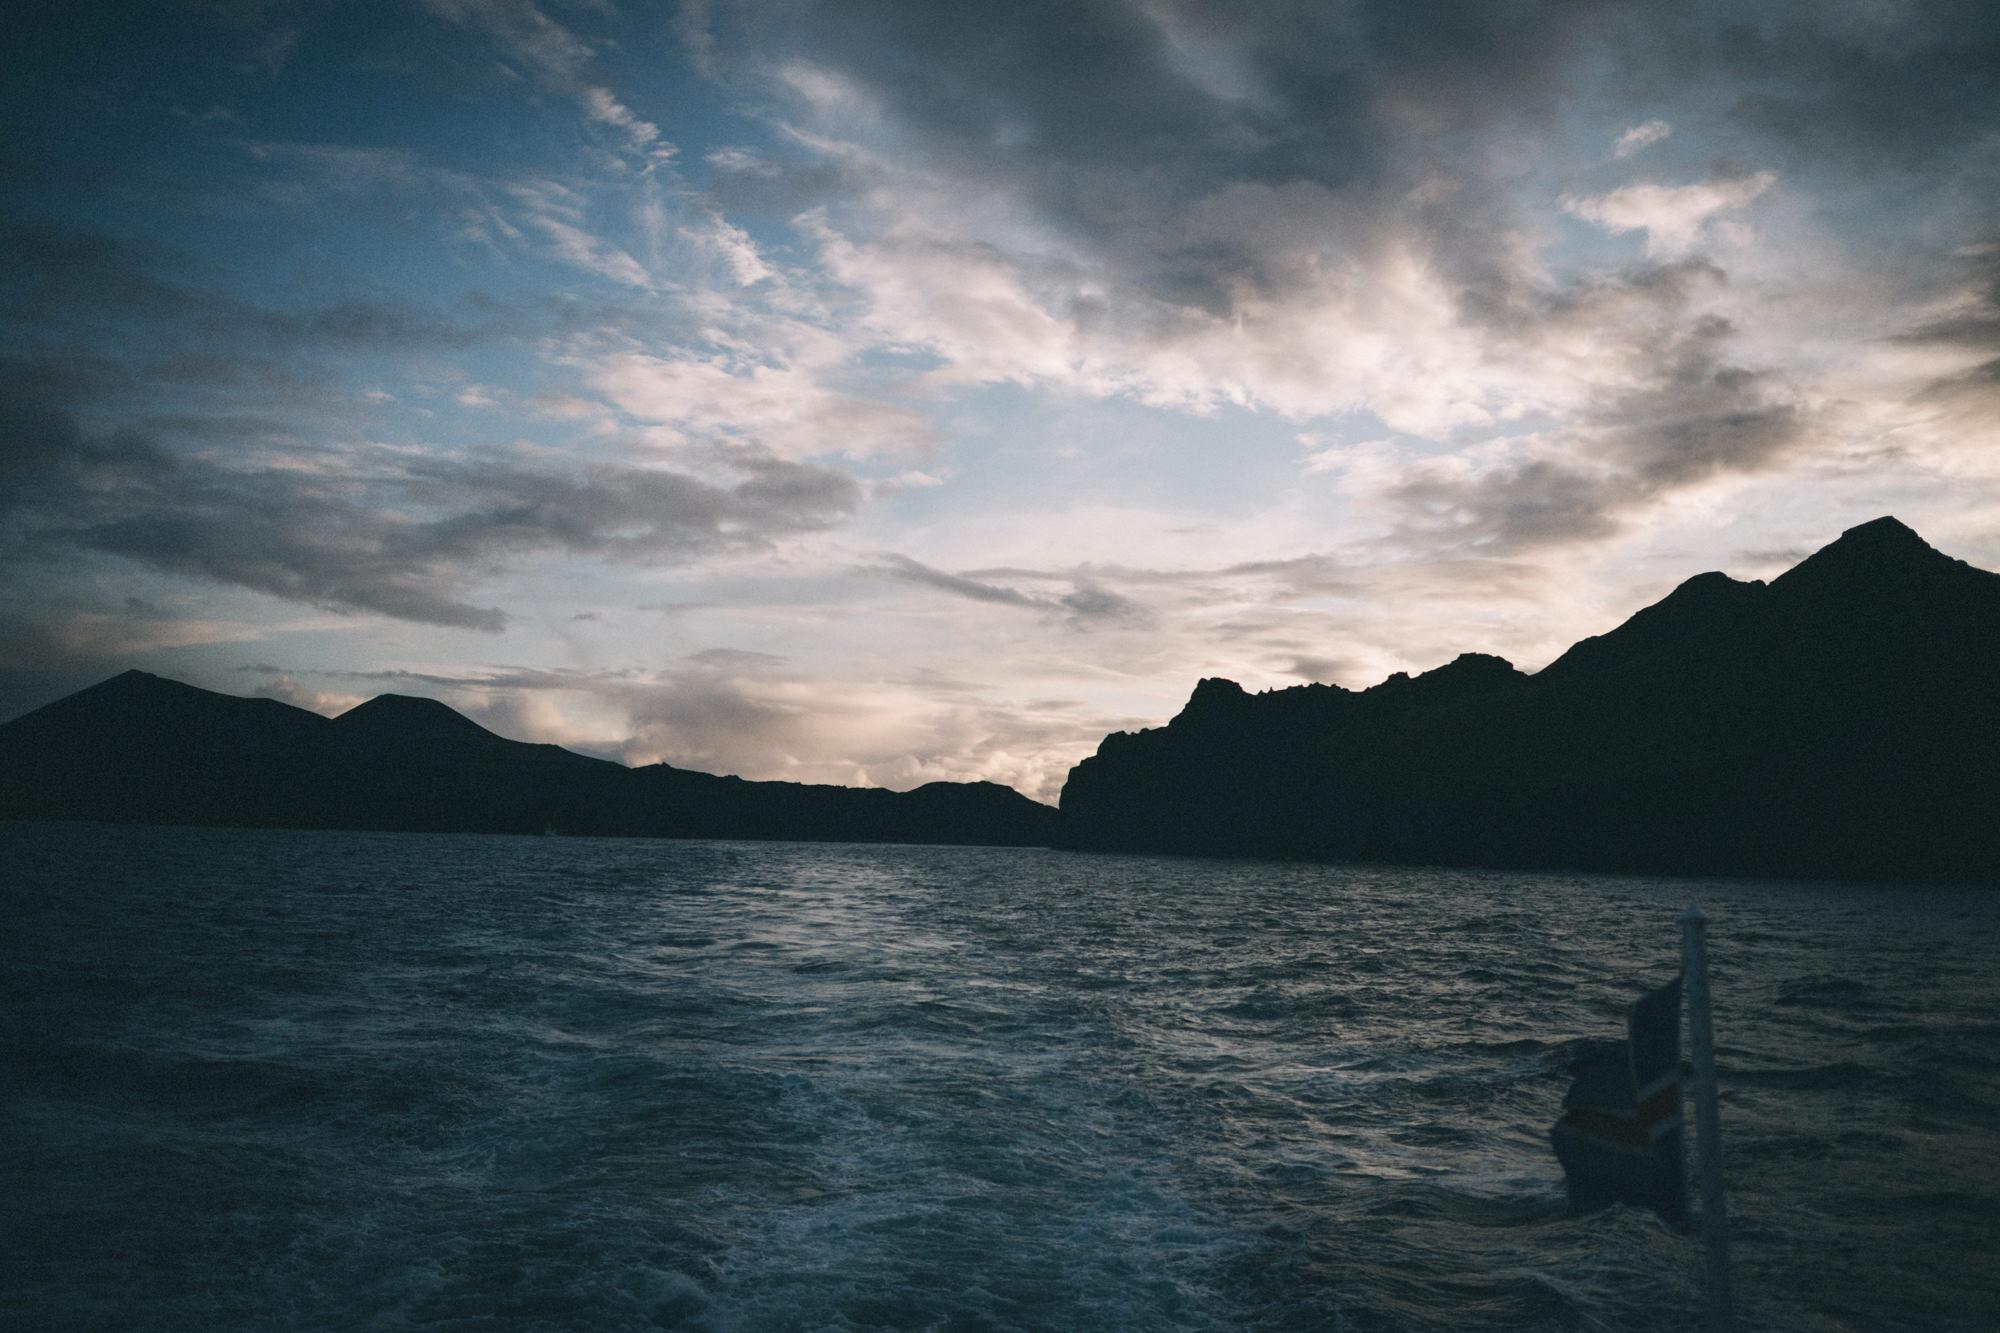 Sarah-Katherine-Davis-Photography-Iceland-Adventure-Elopement-Photographer-Louisville-Kentucky-Wedding-Photographer-Travel-Vik-Beach-Engagement-Session-Cozy-Iceland-South-Coast-511edit.jpg